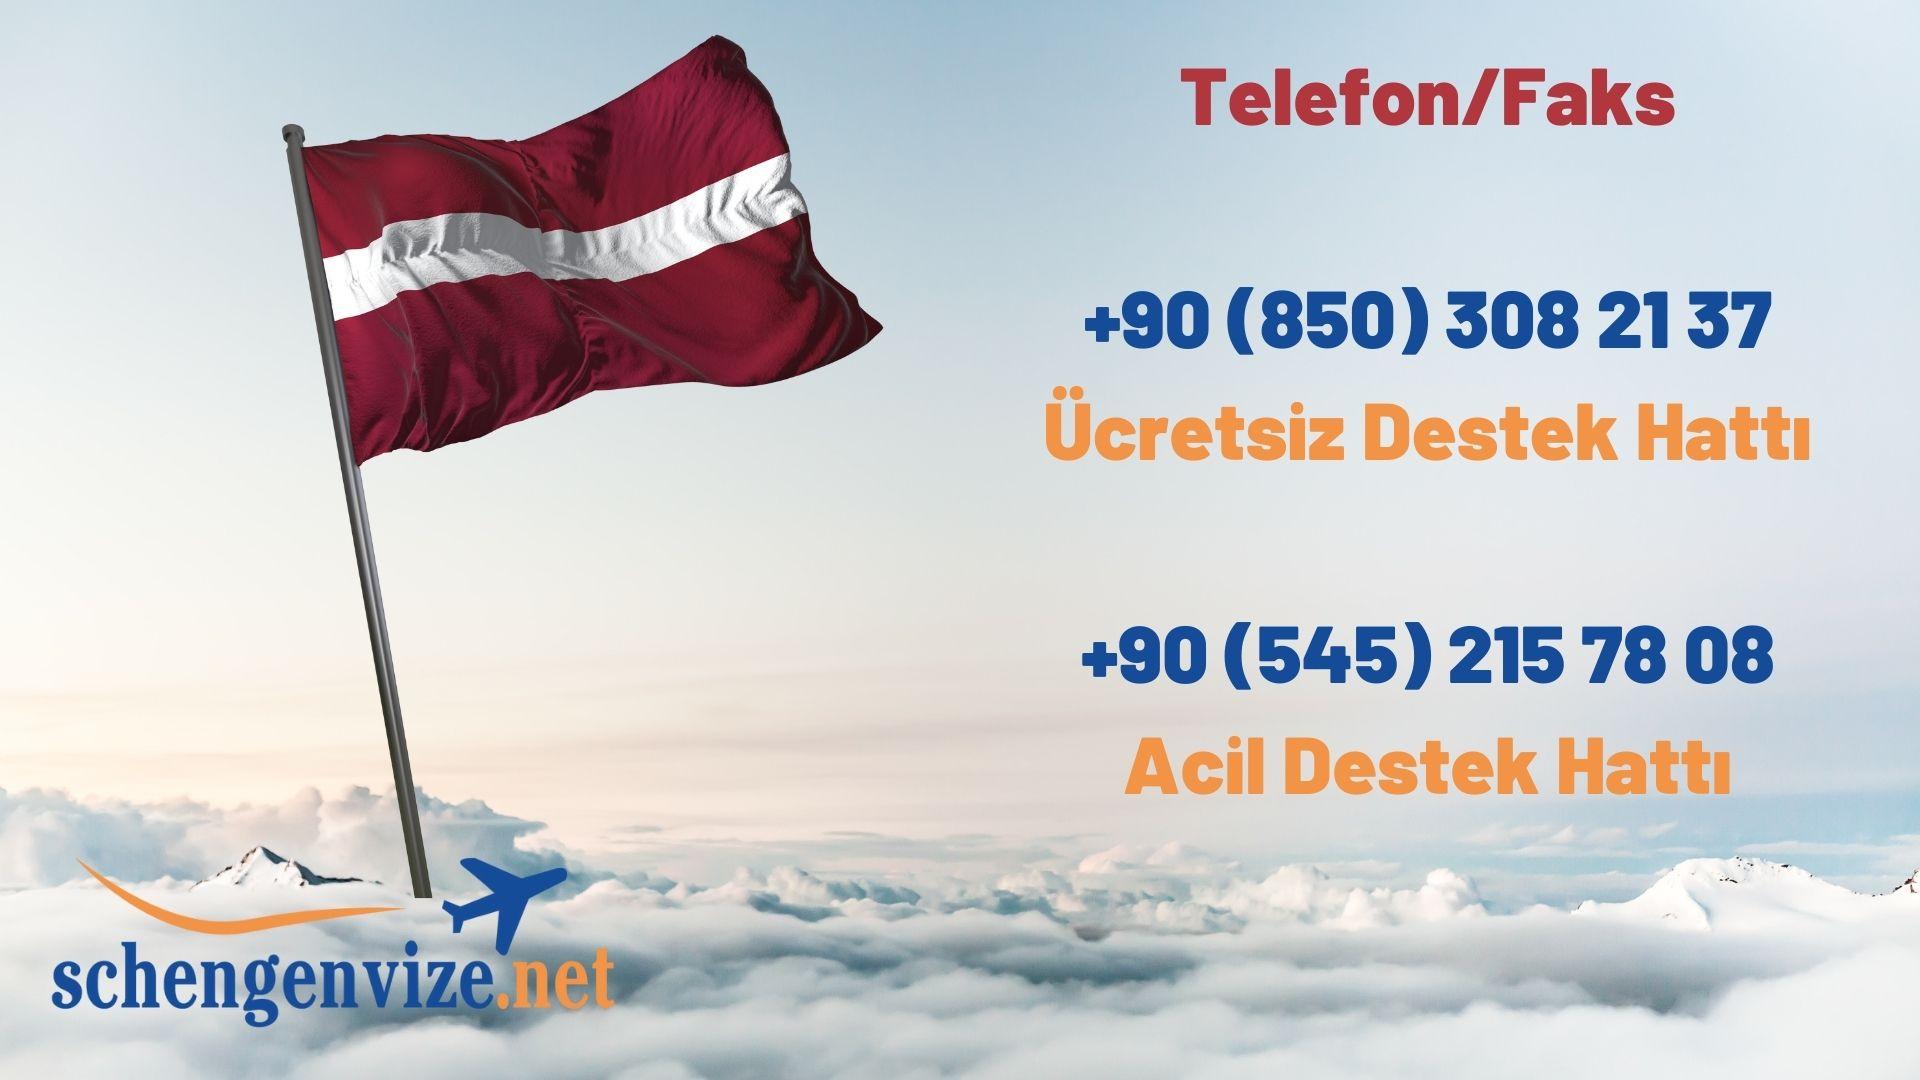 Letonya Vize İstiyor Mu?